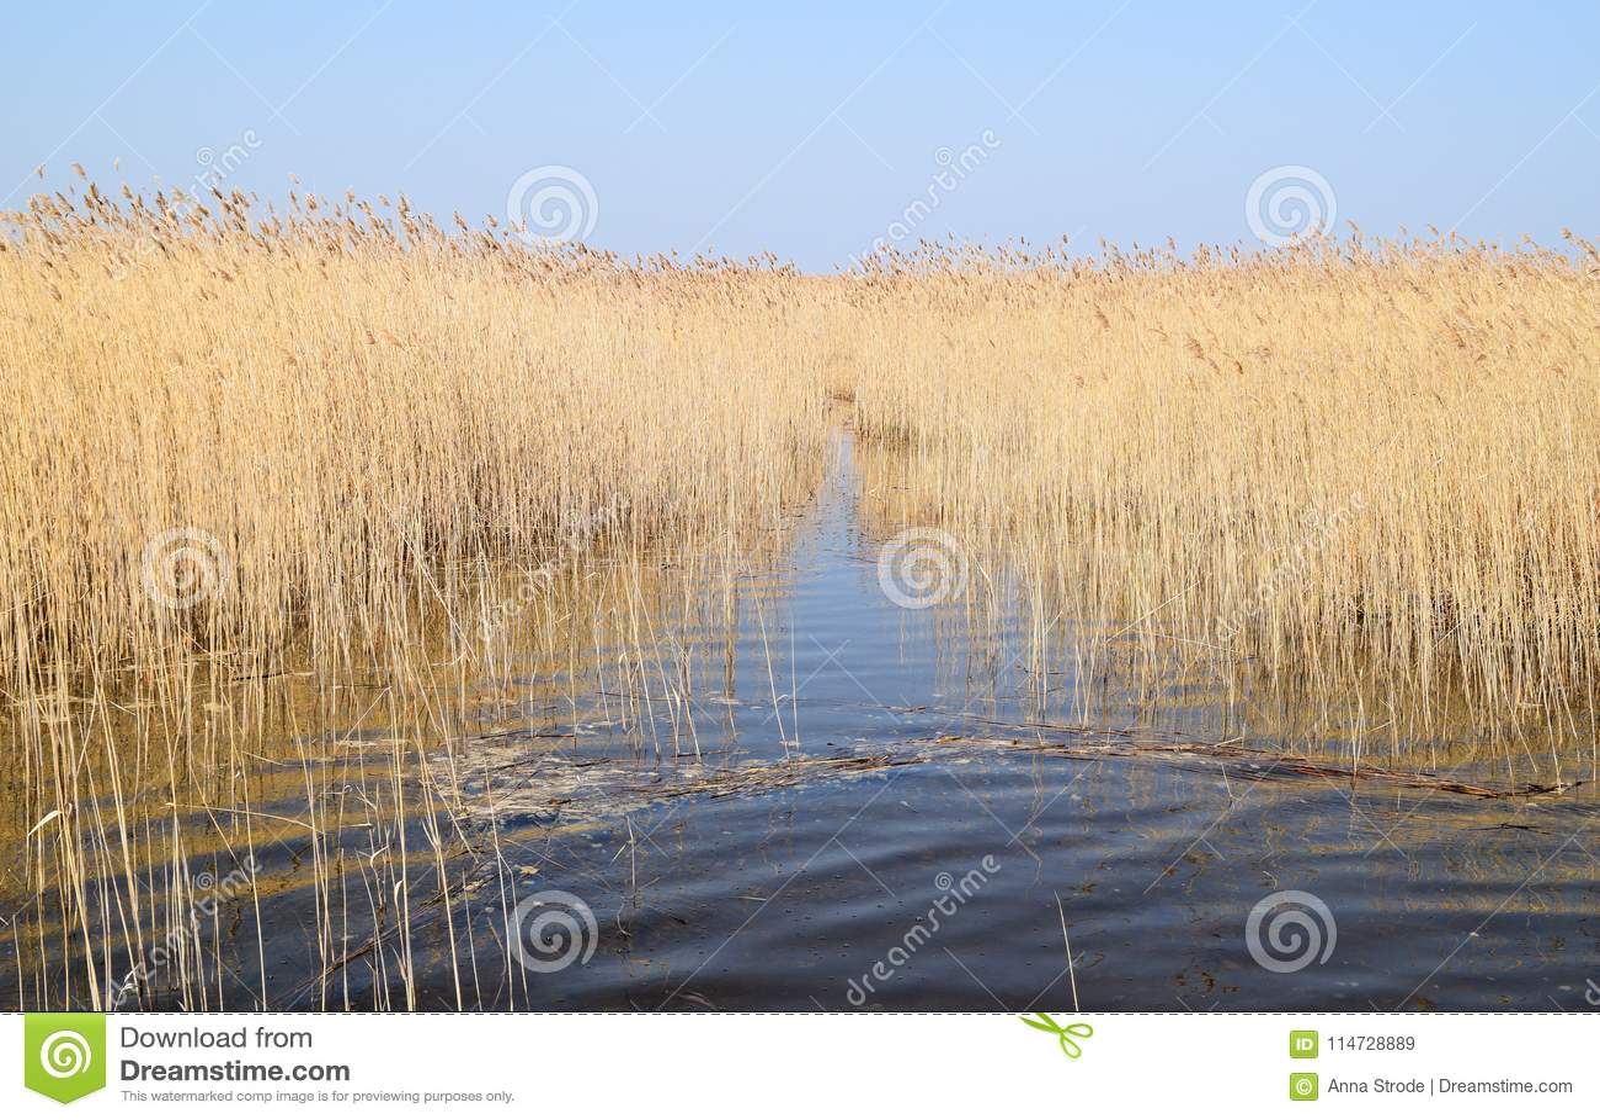 Phragmites perennial grasses in wetlands.